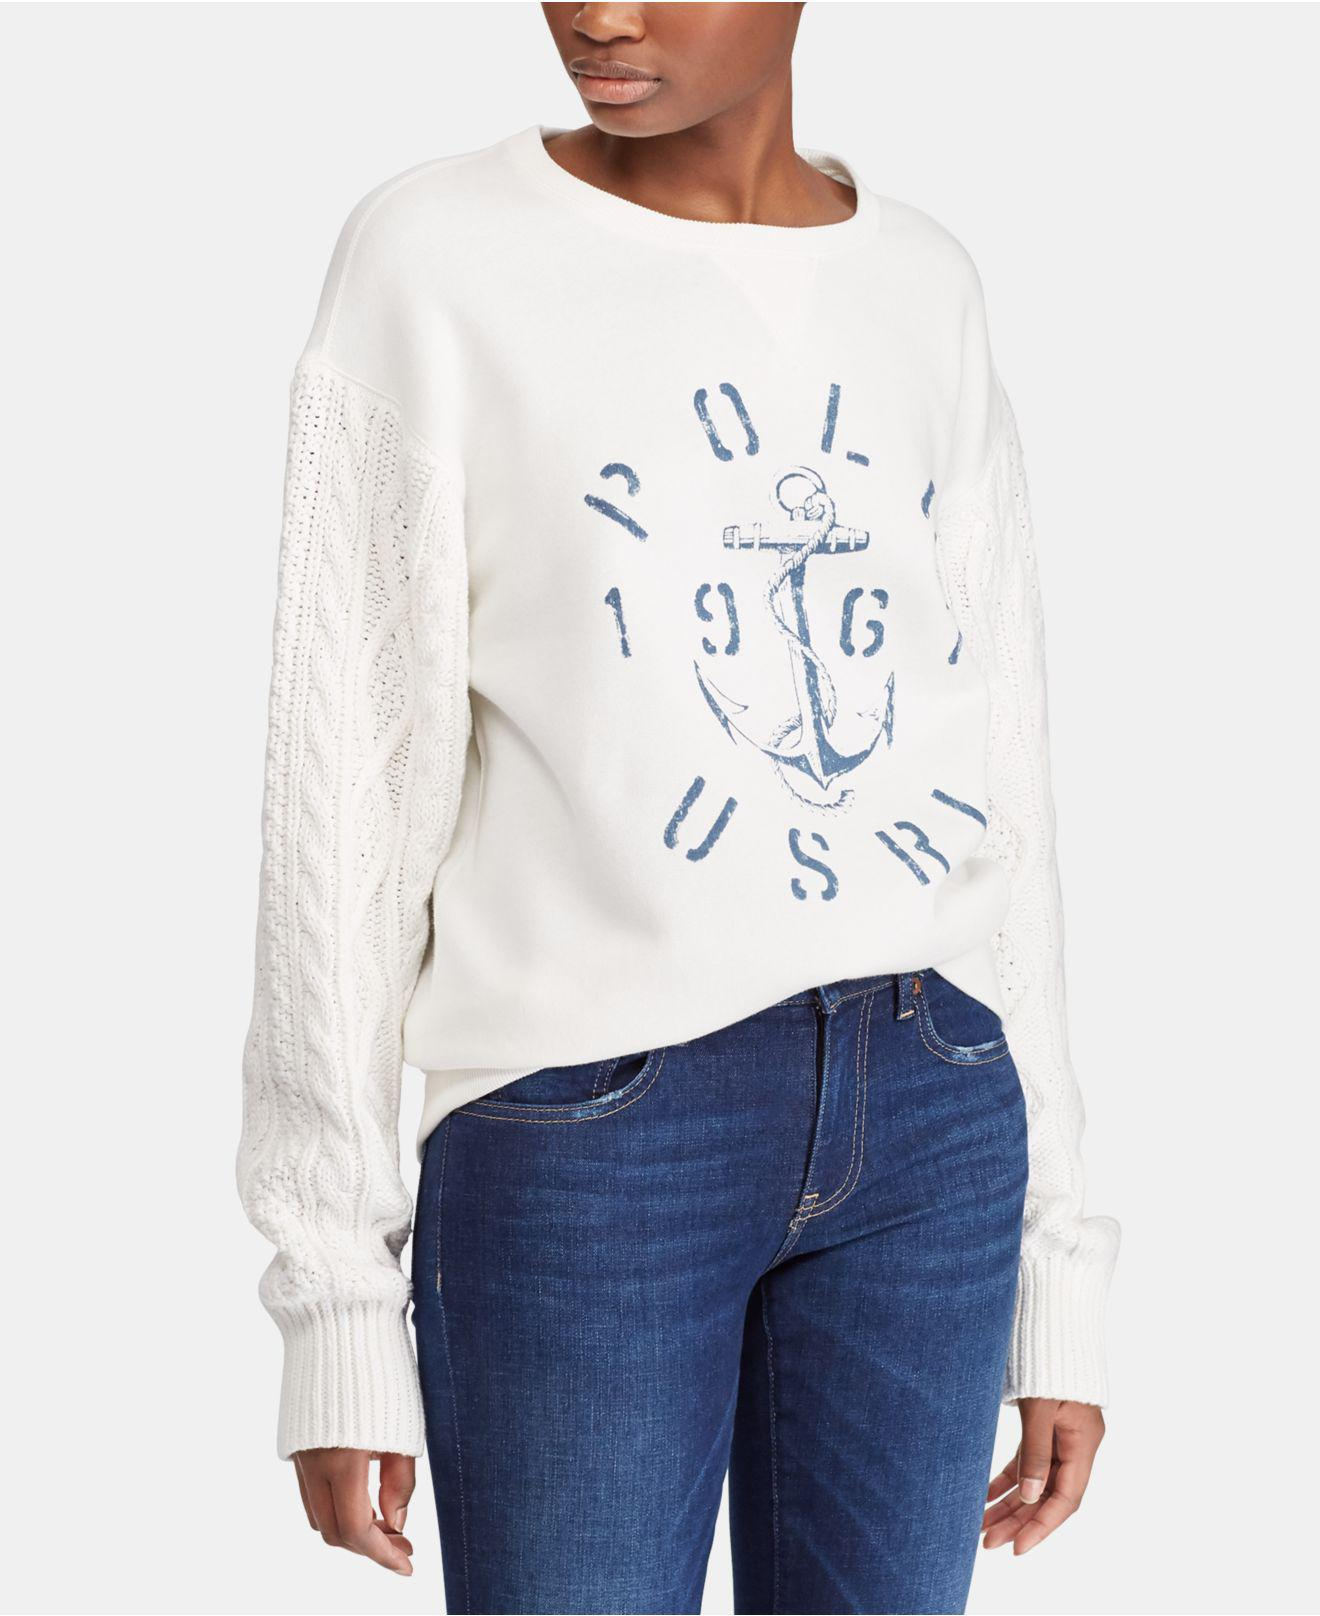 befca3ee084c Lyst - Polo Ralph Lauren Aran-knit Fleece Pullover in White - Save 30%